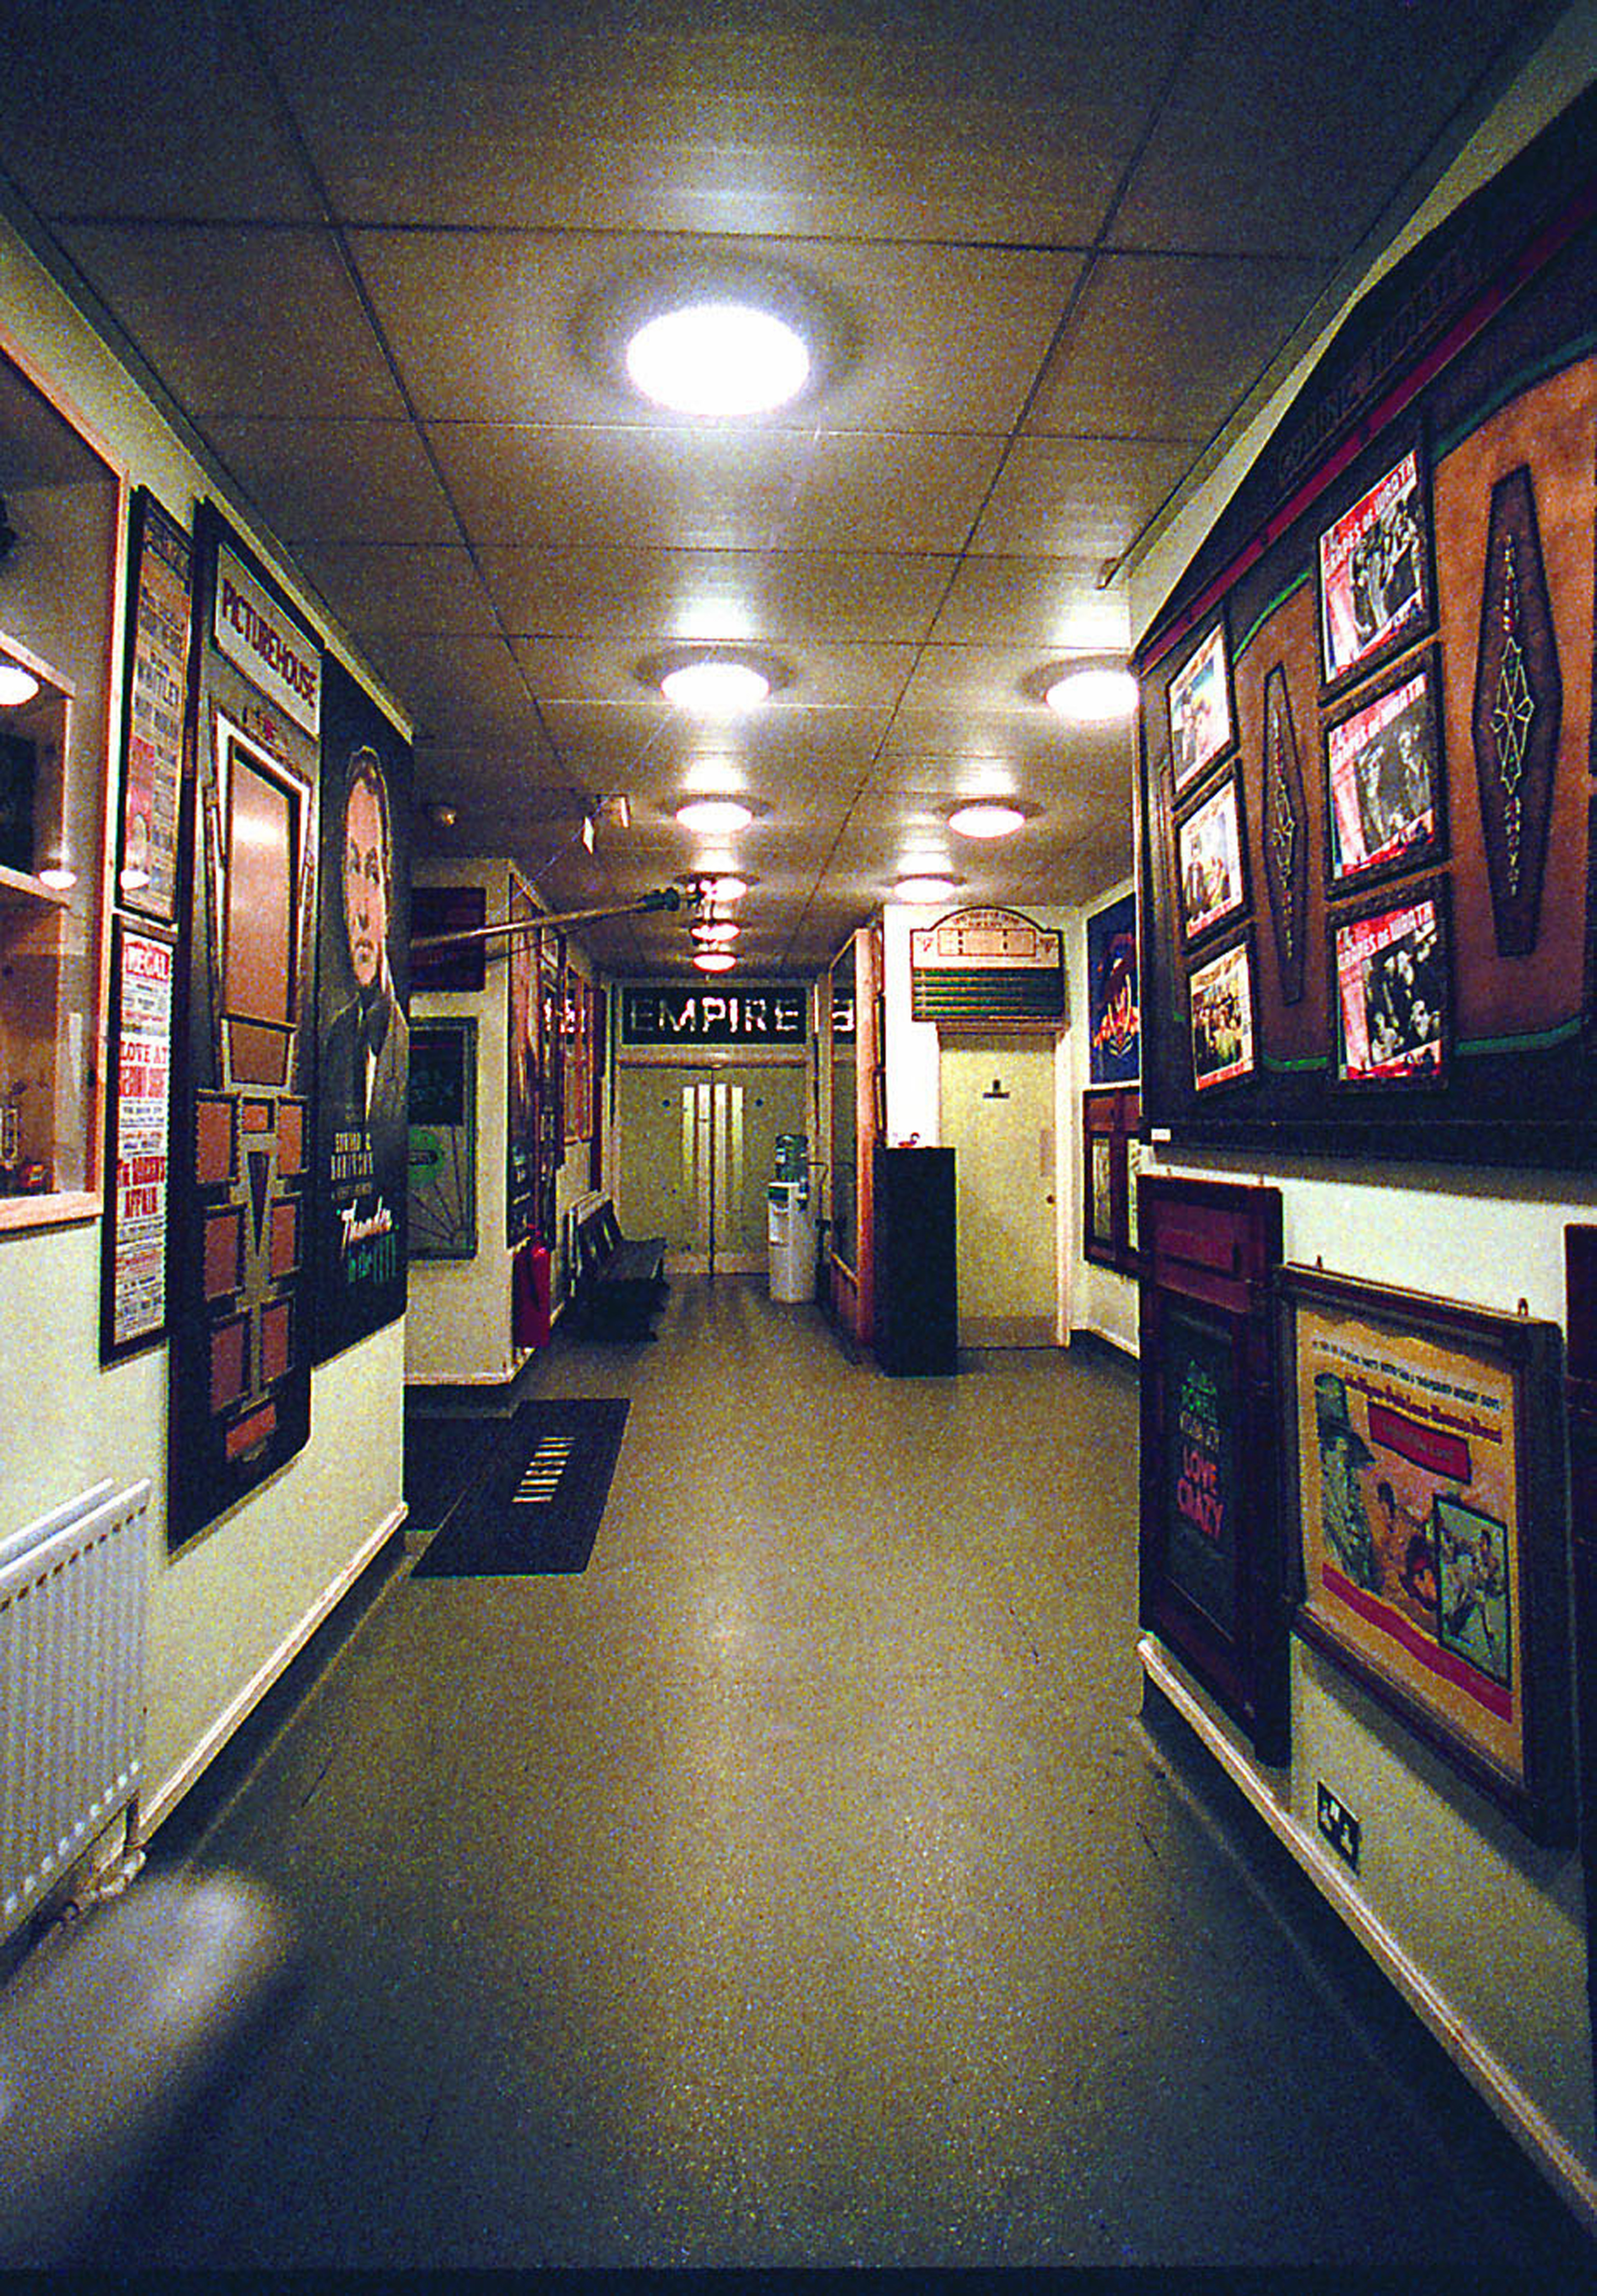 fileinterior cinema museum kennington lambethjpg